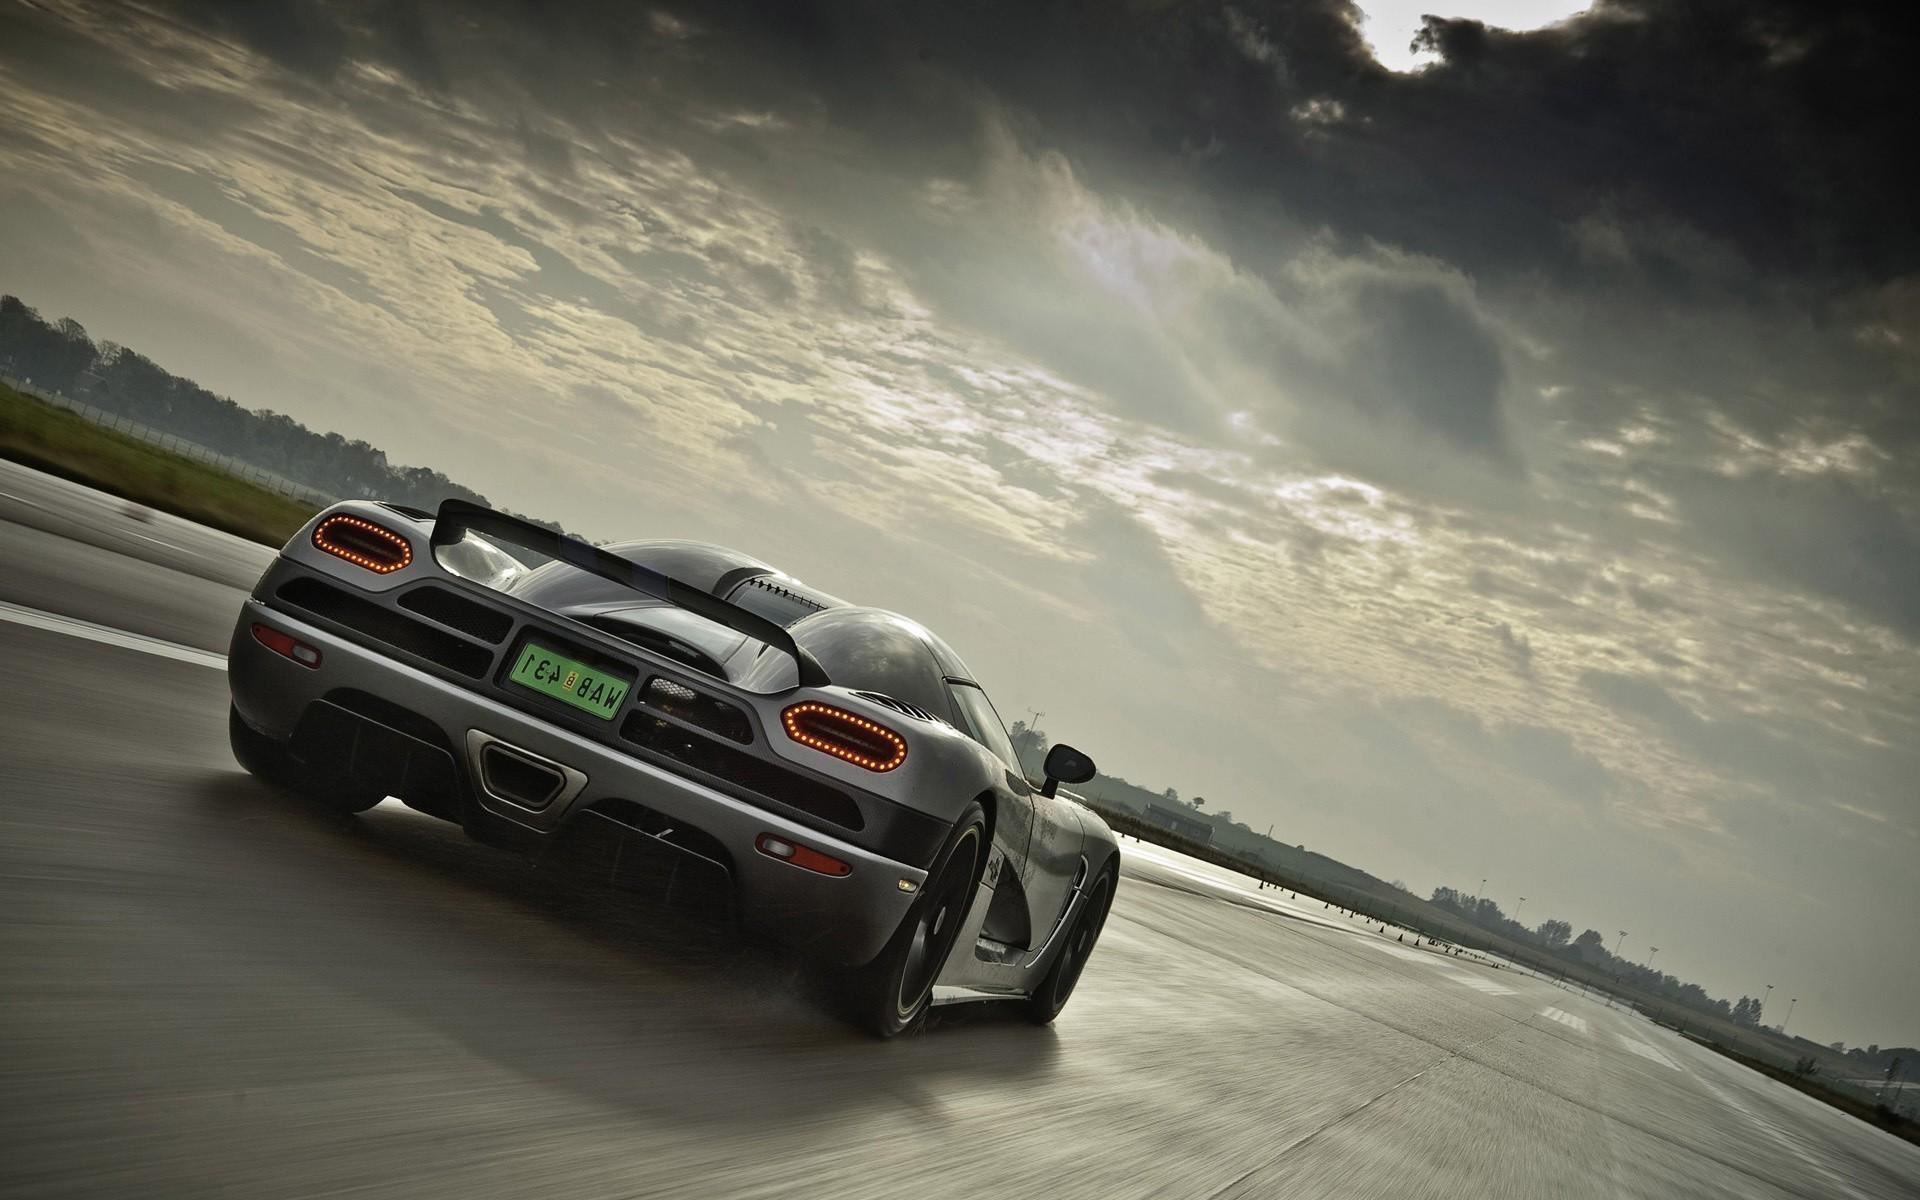 1920x1200 Koenigsegg Agera R 1080p Resolution Hd 4k Wallpapers